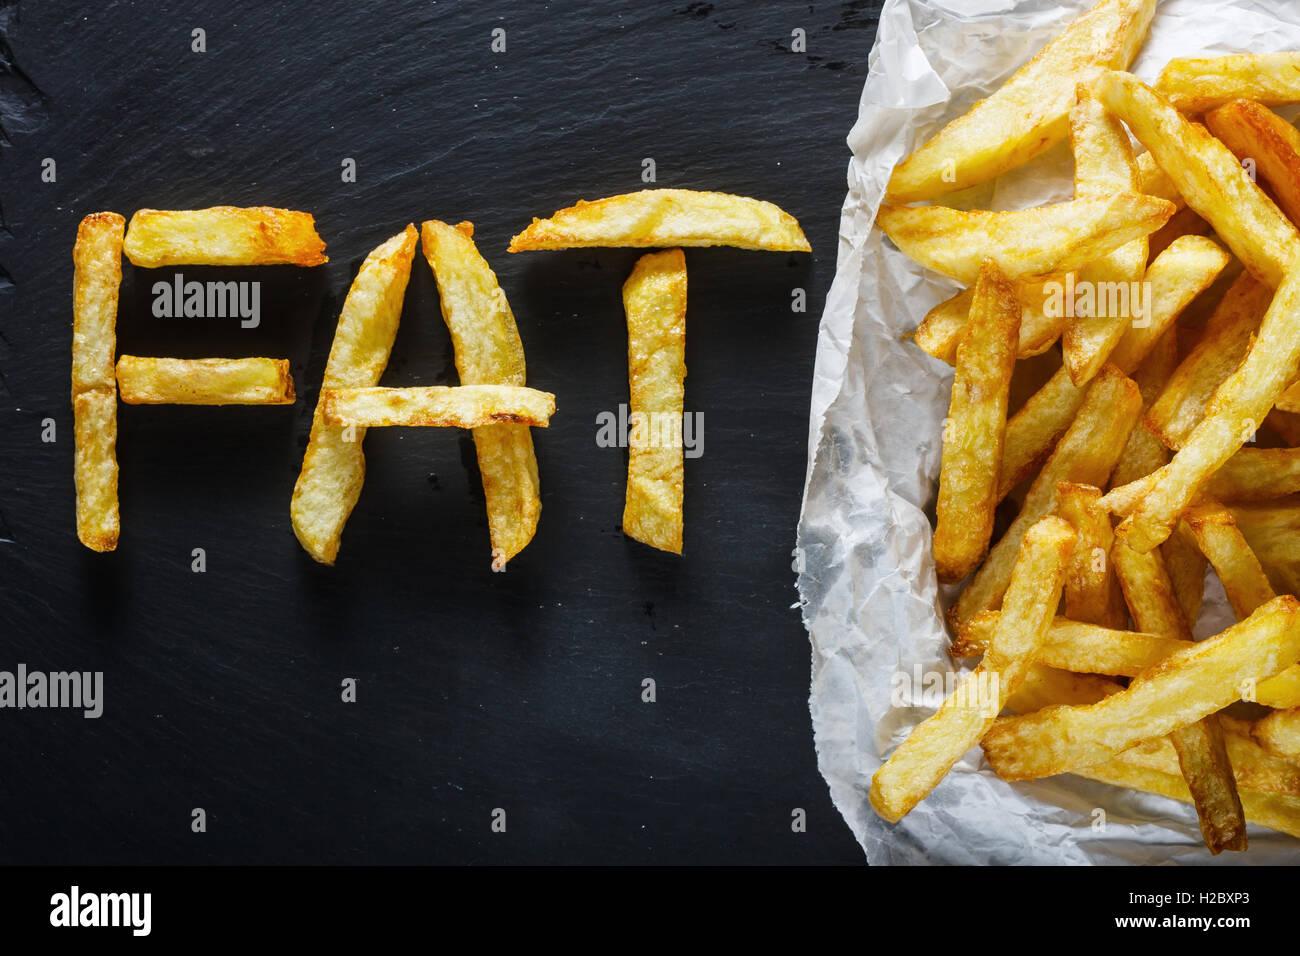 Concepto de alimentos insalubres - Papas fritas en placa de pizarra Imagen De Stock